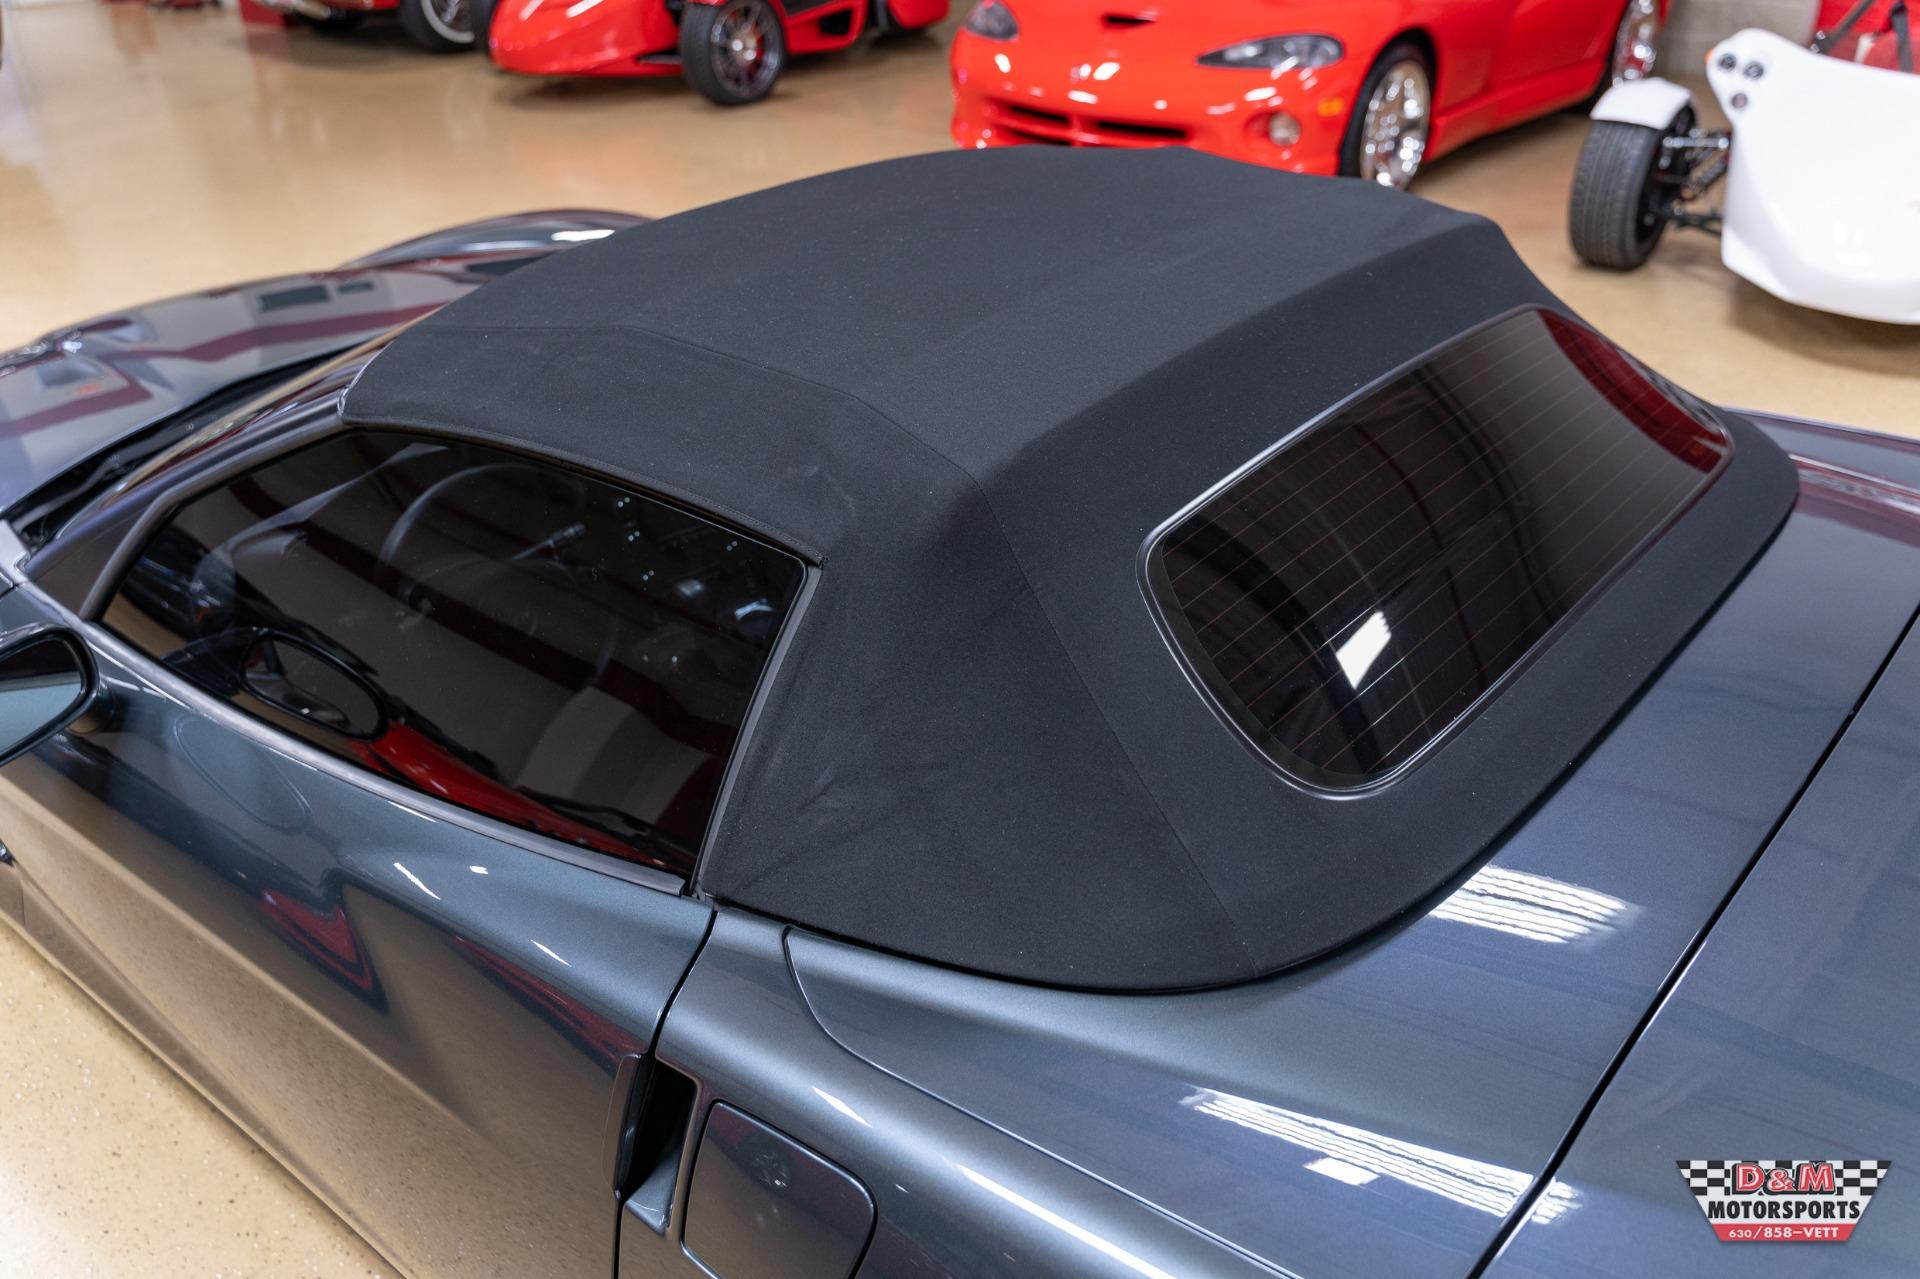 Used 2009 Chevrolet Corvette Convertible   Glen Ellyn, IL